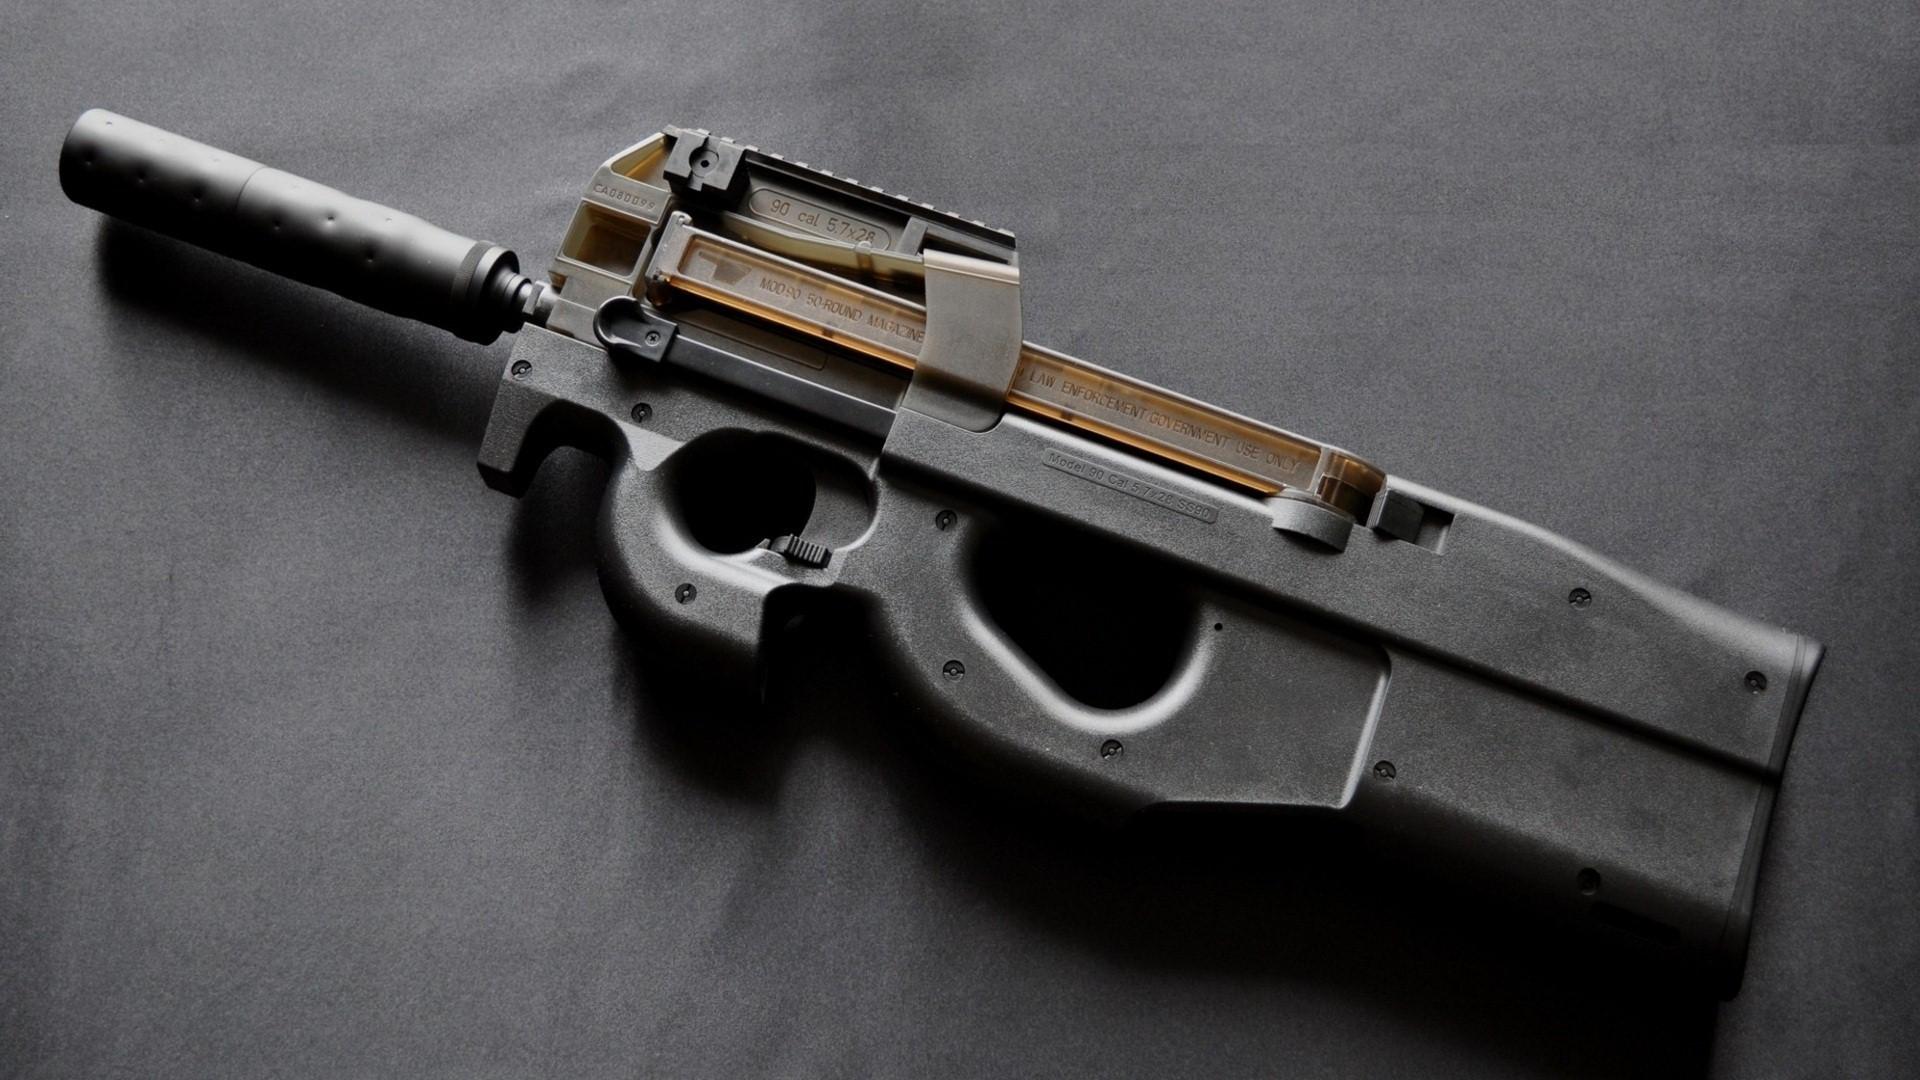 FN P90 Sub Machine Gun HD Wallpaper HD Wallpapers 1920x1080